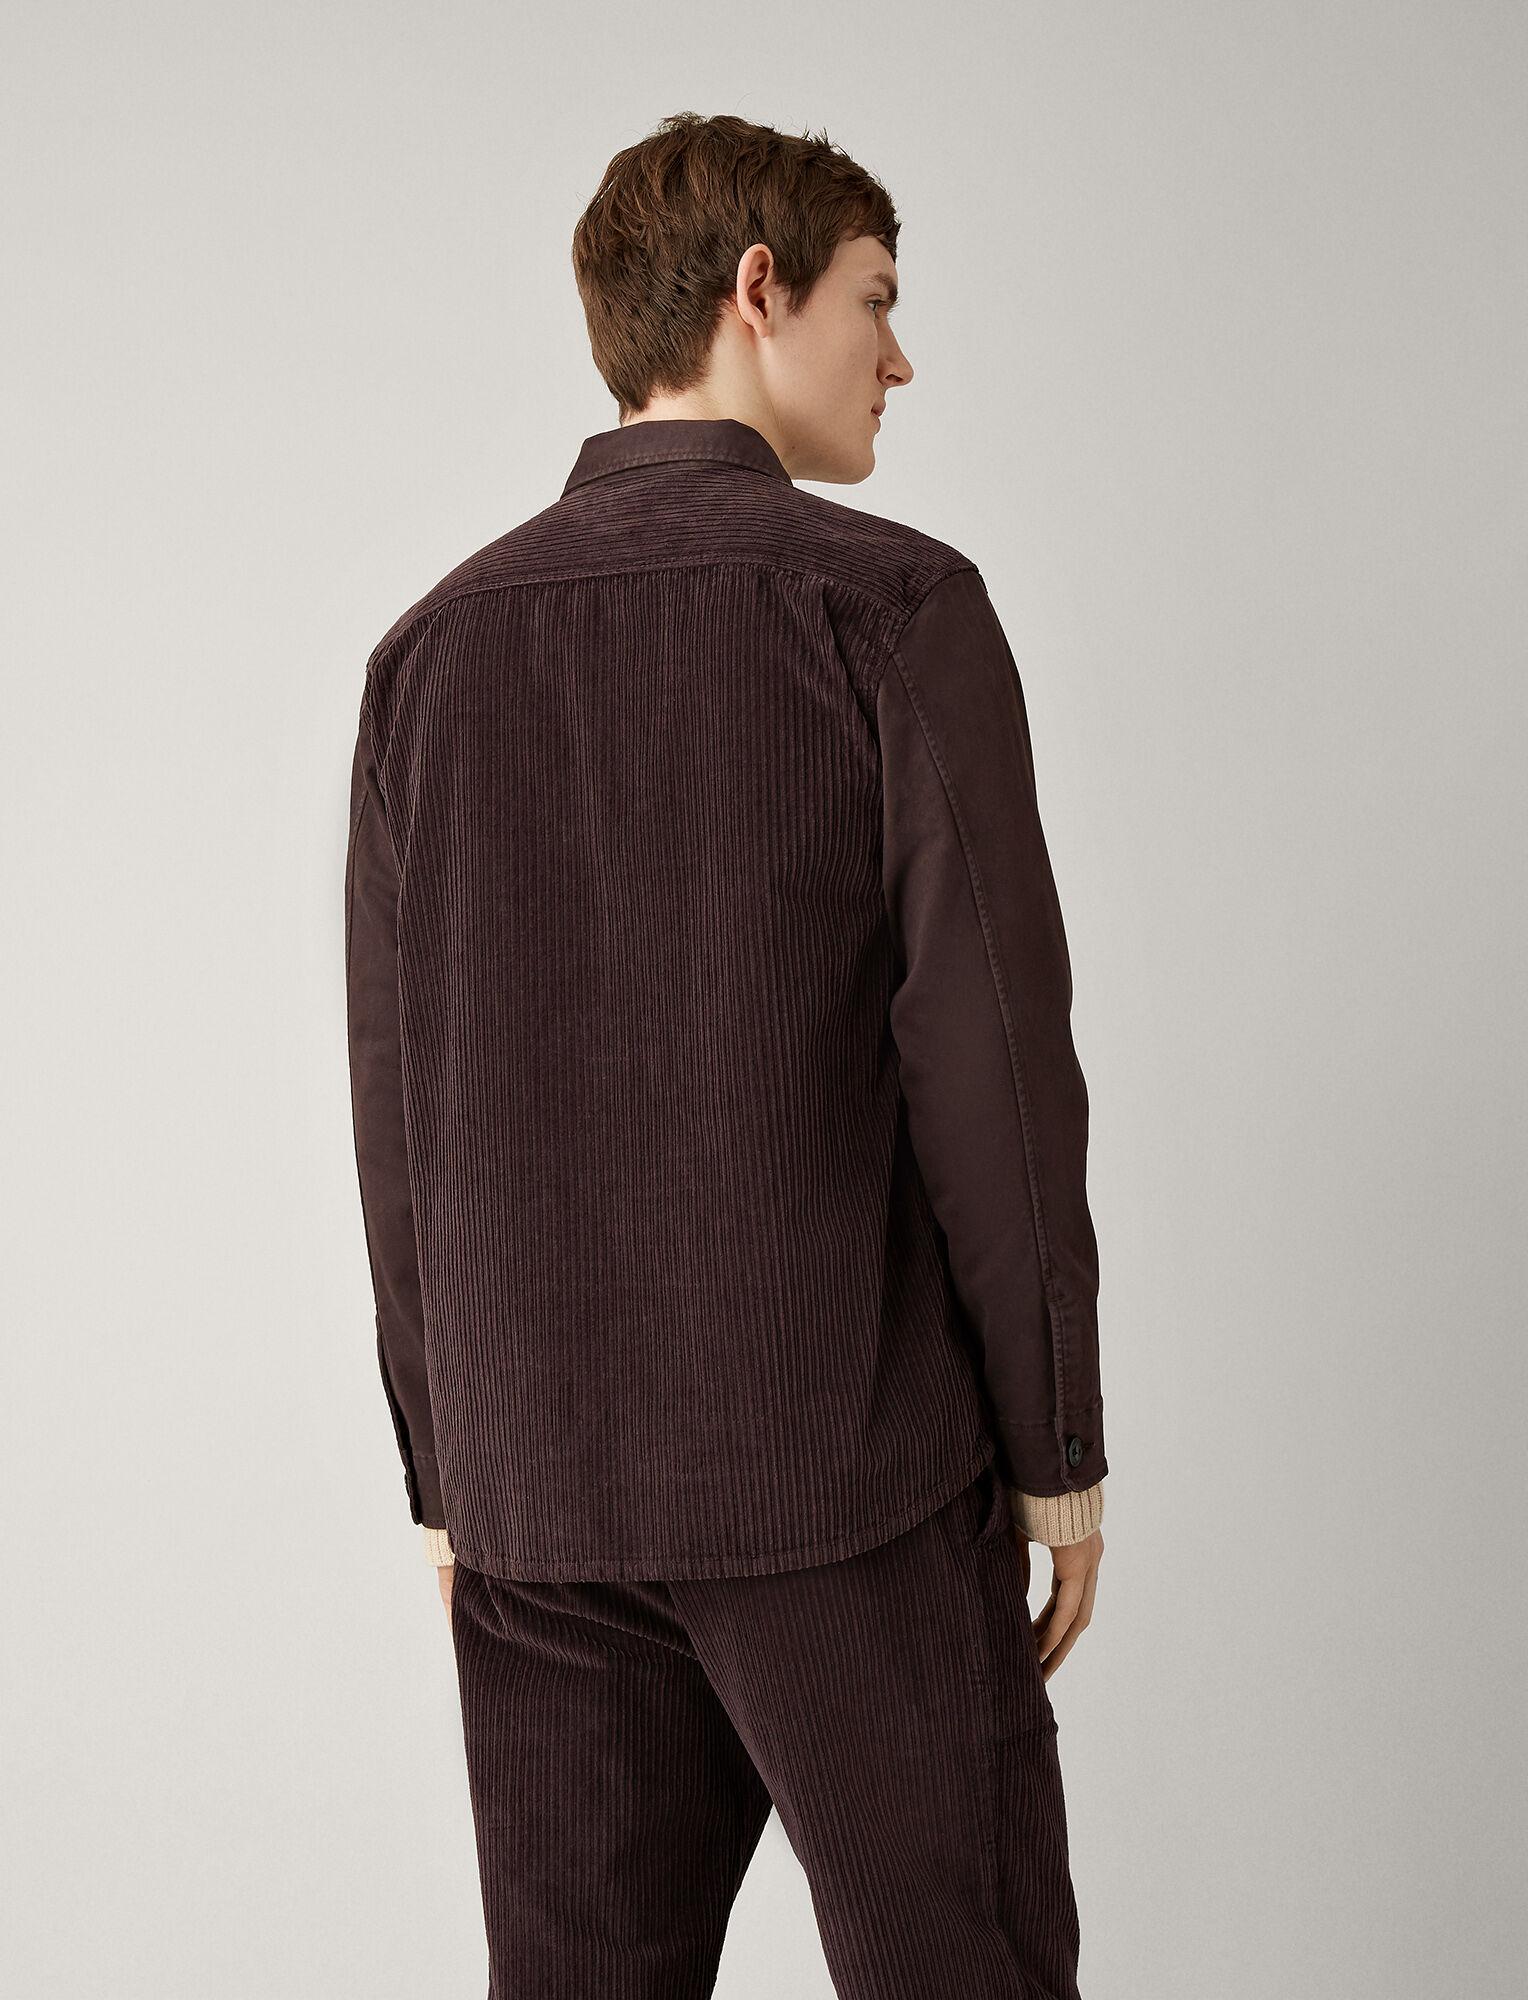 Joseph, Bennet Corduroy Shirt, in BURGUNDY